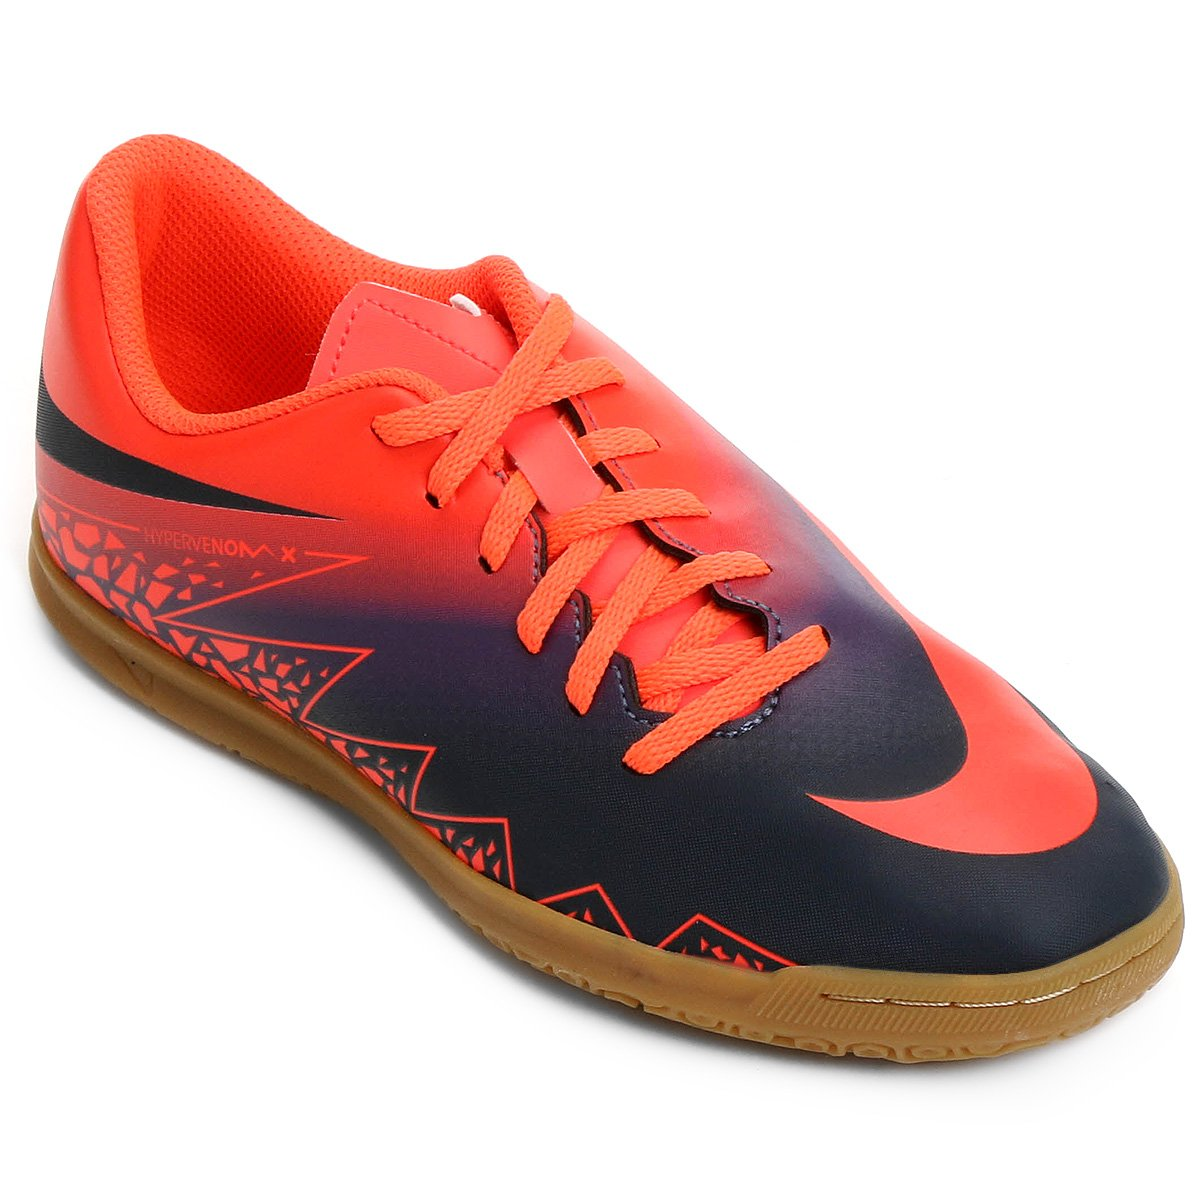 a2157cfda9271 ... hot chuteira futsal infantil nike hypervenom phade 2 ic compre agora  netshoes 1c173 6c03a